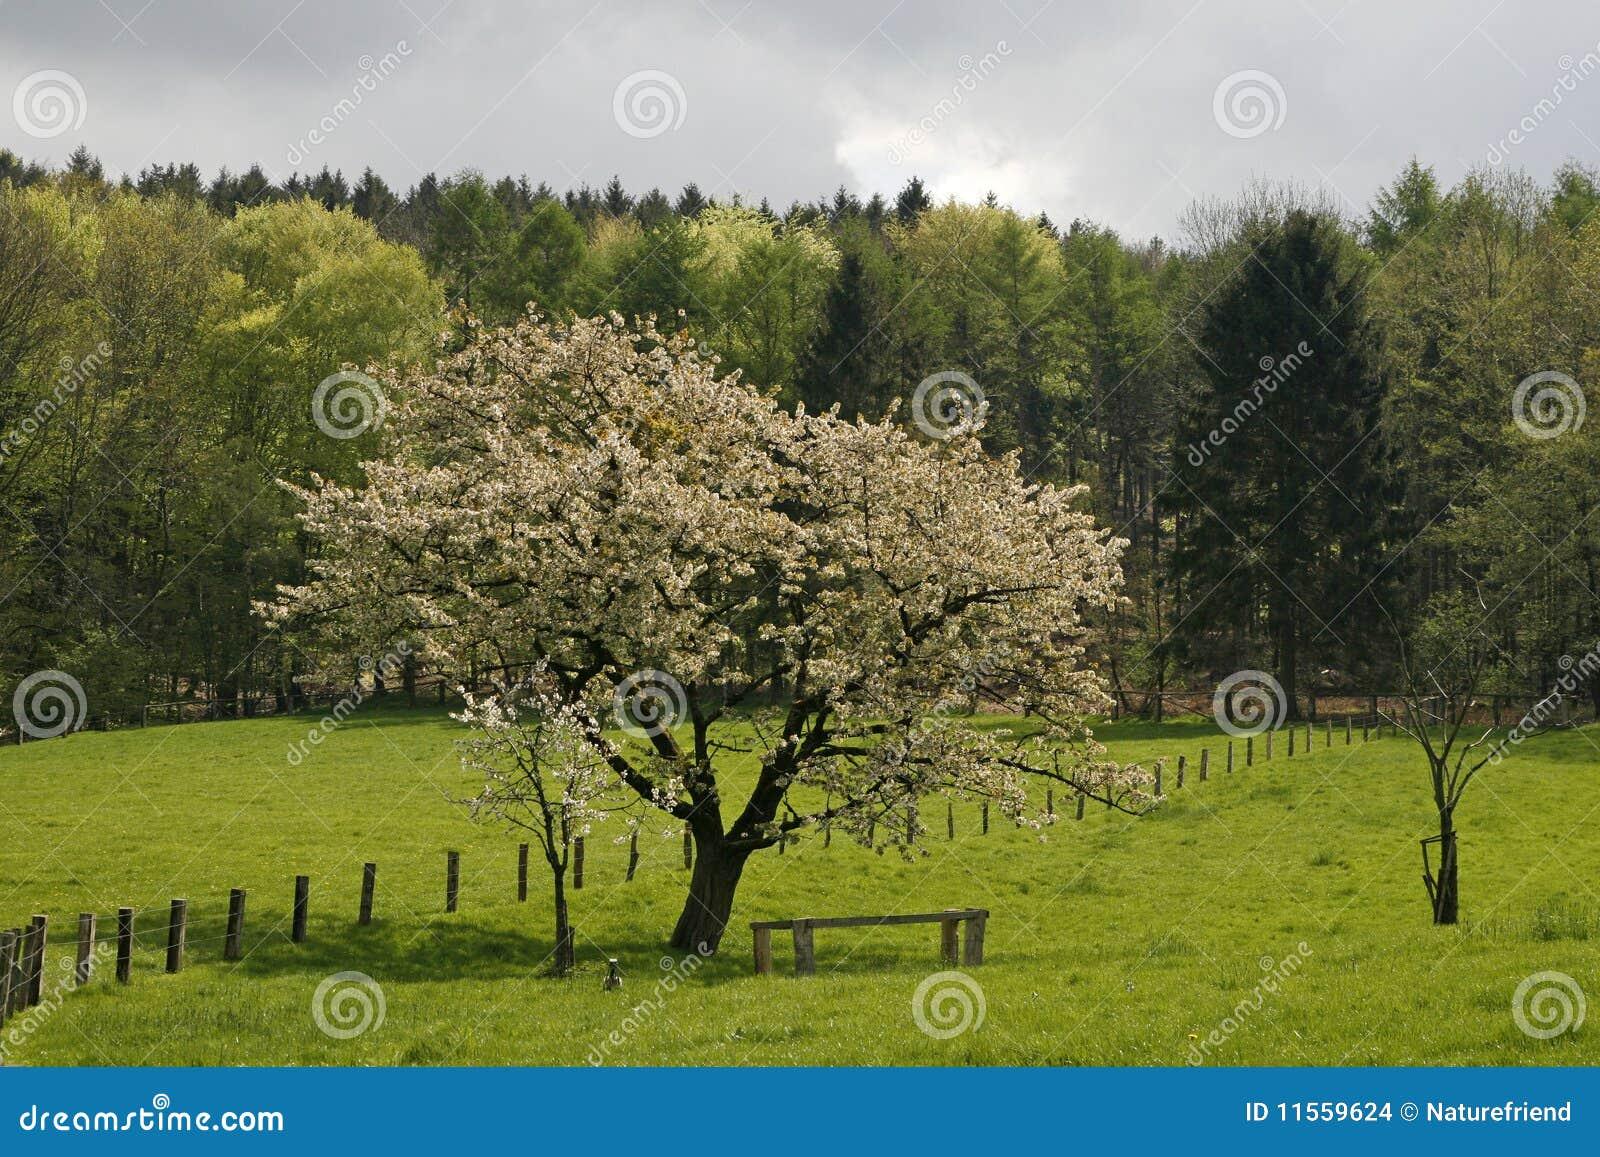 Cherry tree in spring, Lower Saxony, Germany